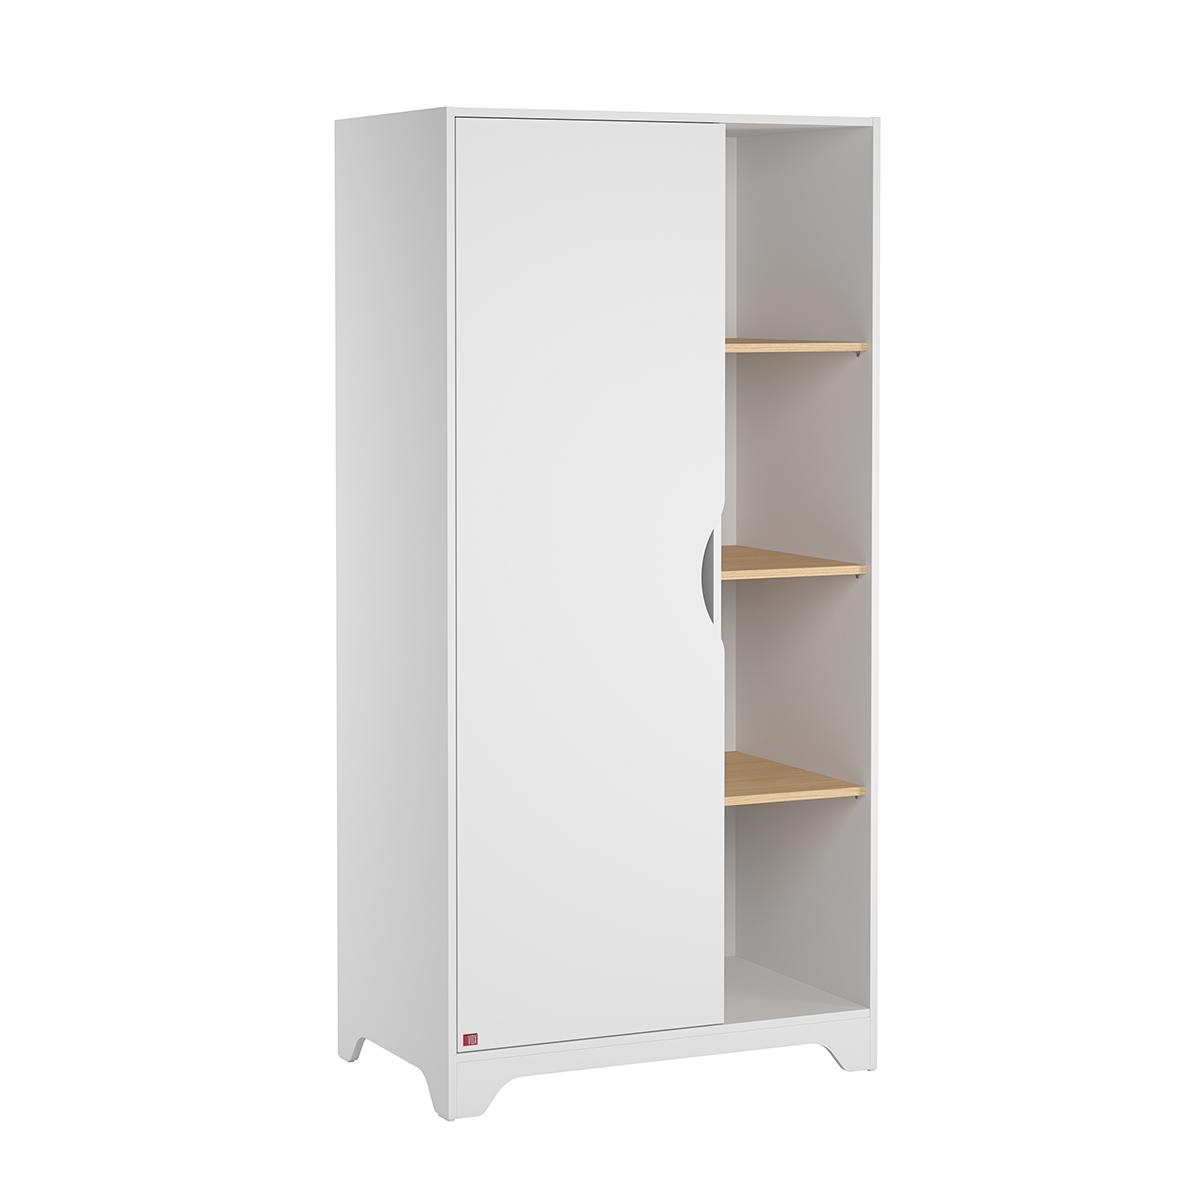 Armoire 1 porte blanc bois